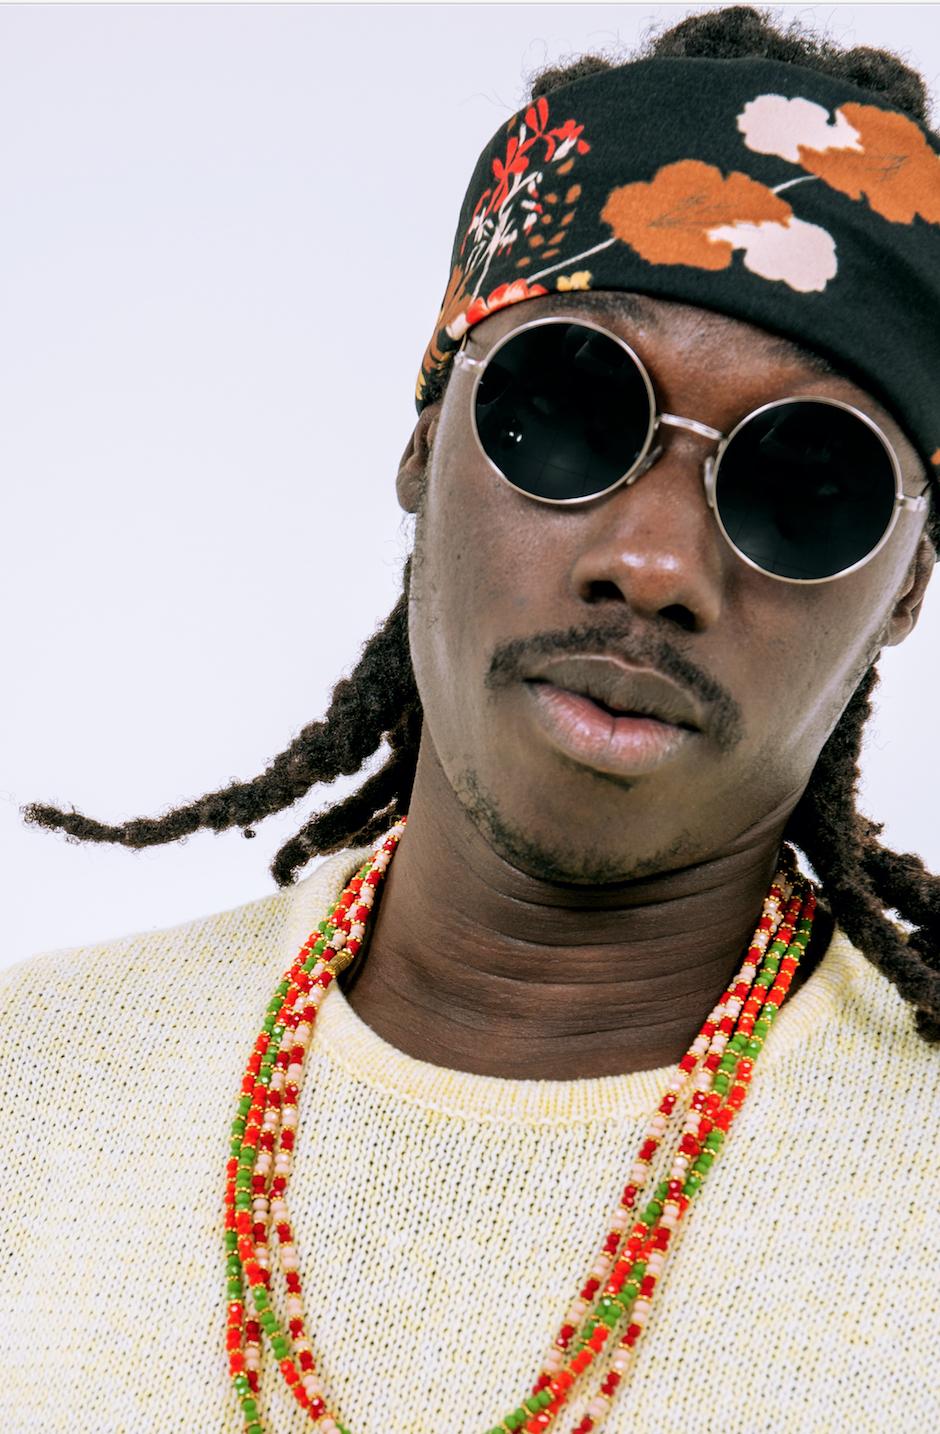 NIX, LA NIAQUE MADE IN SENEGAL | Gonzo Music